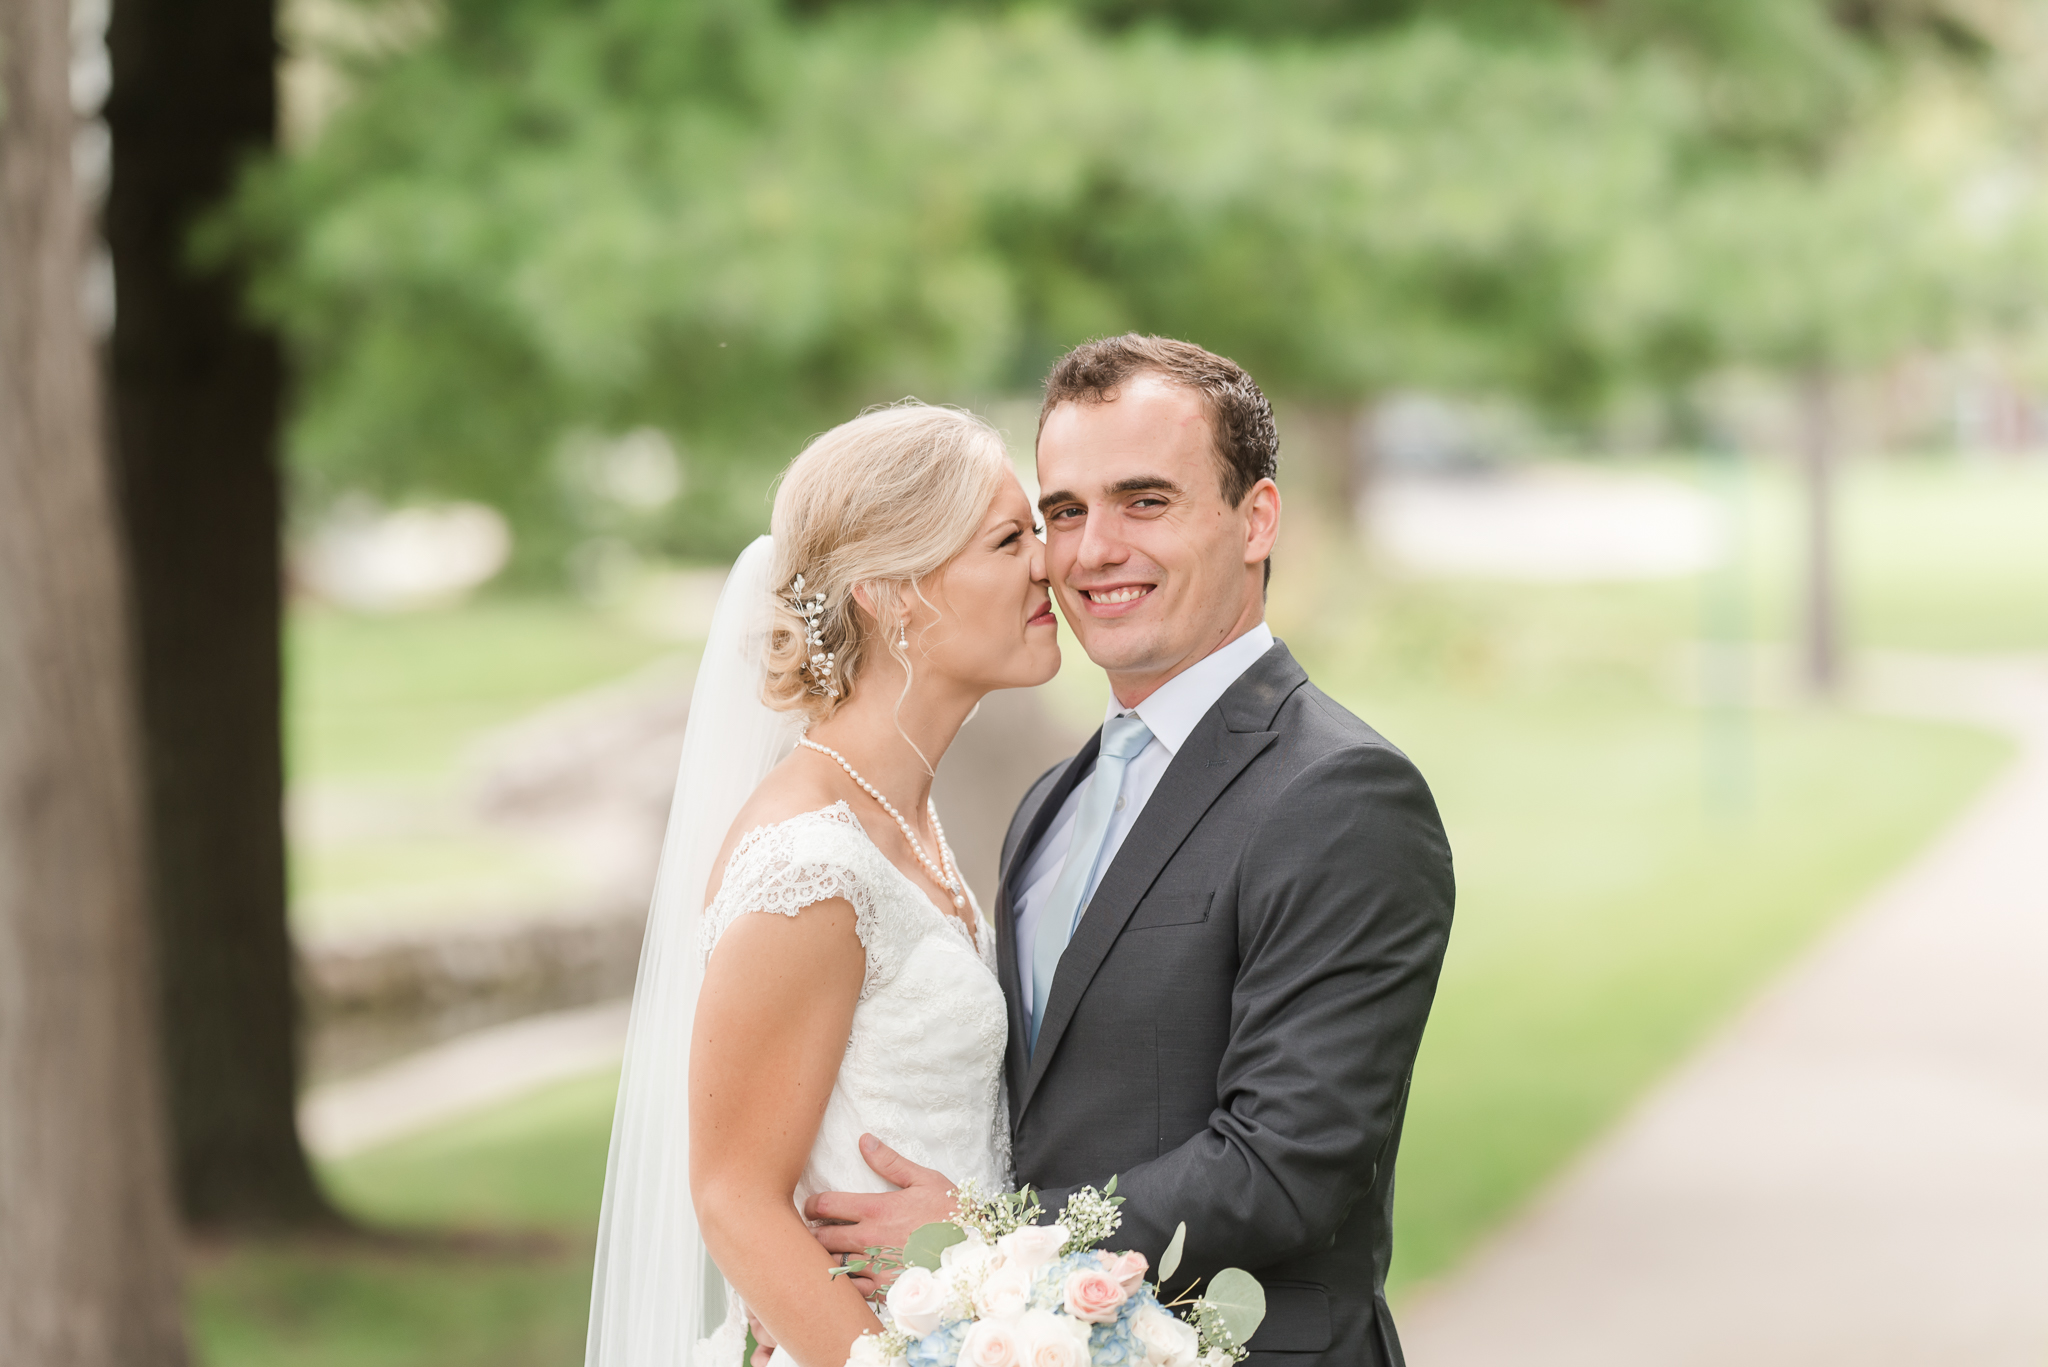 Westminister Hall Wedding Winona Lake Indiana8540.jpg